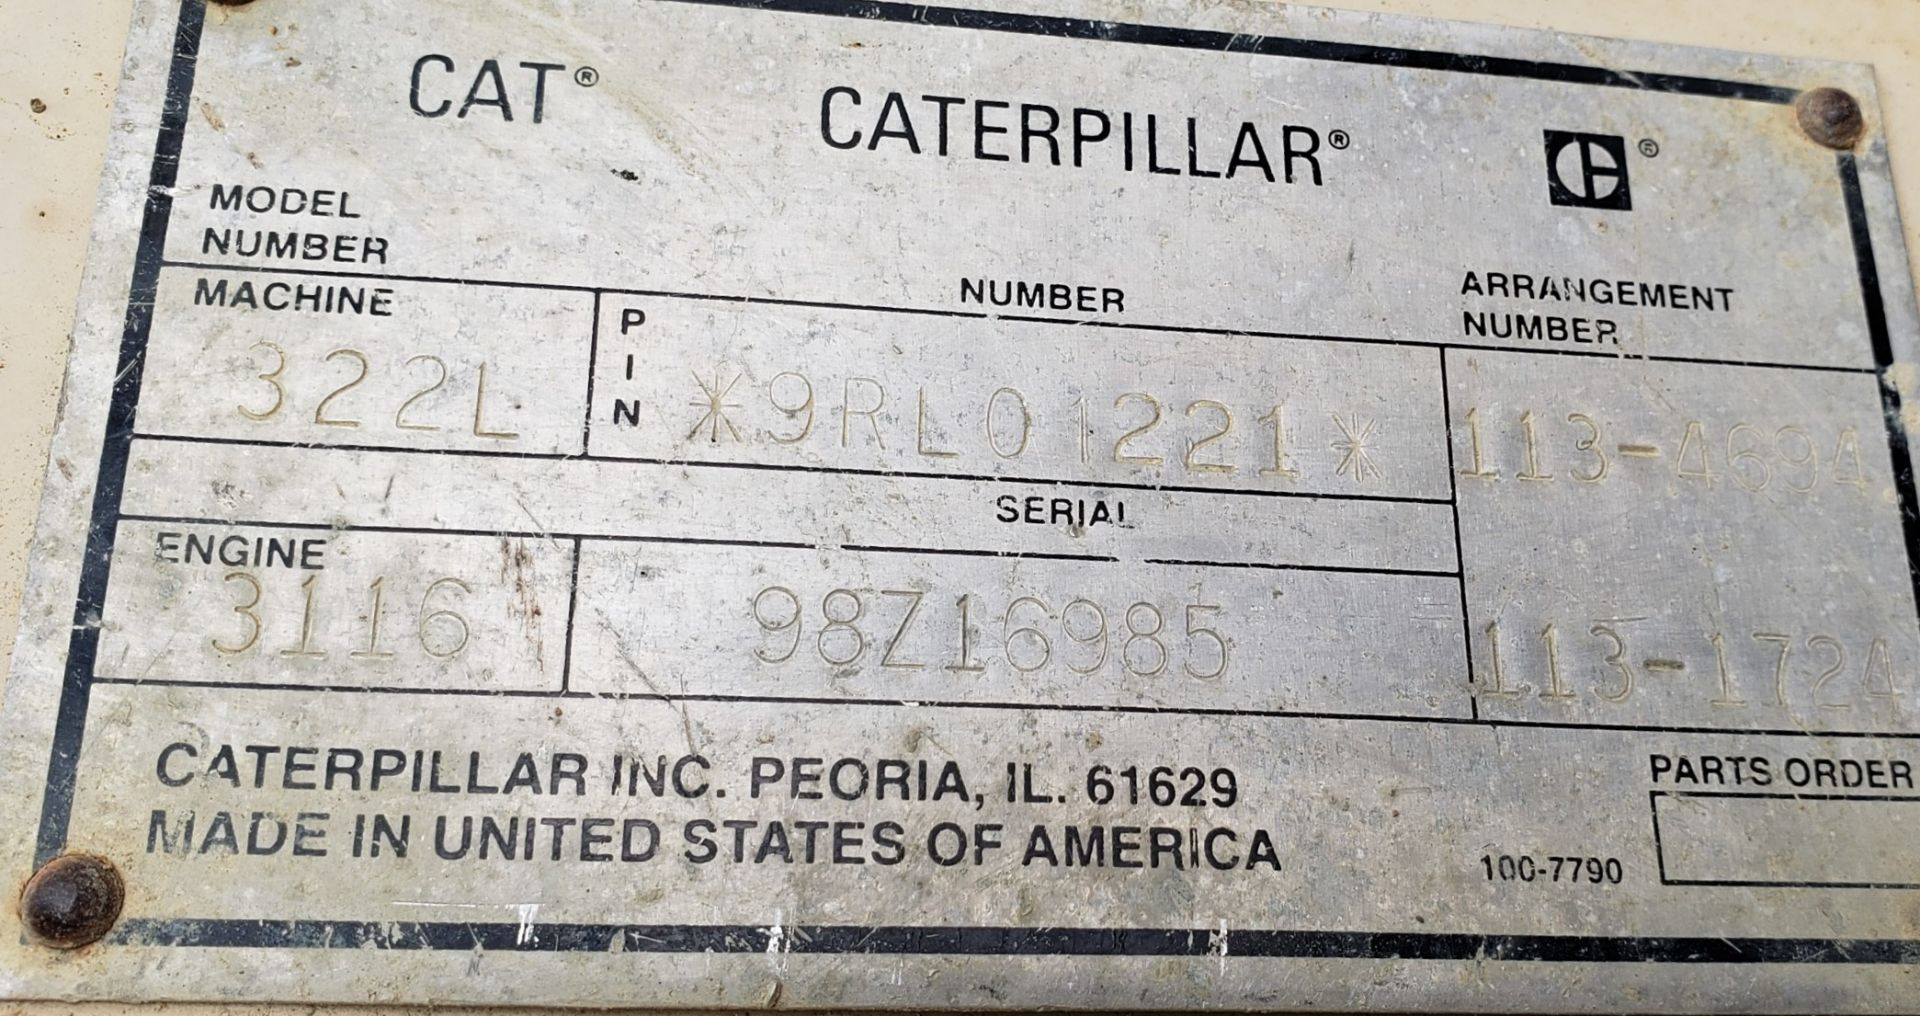 1996 Caterpillar 322L Hydraulic Excavator, Enclosed Cab, 28 in Bucket, Cat 3116 Engine, 9579 Hours - Image 17 of 18